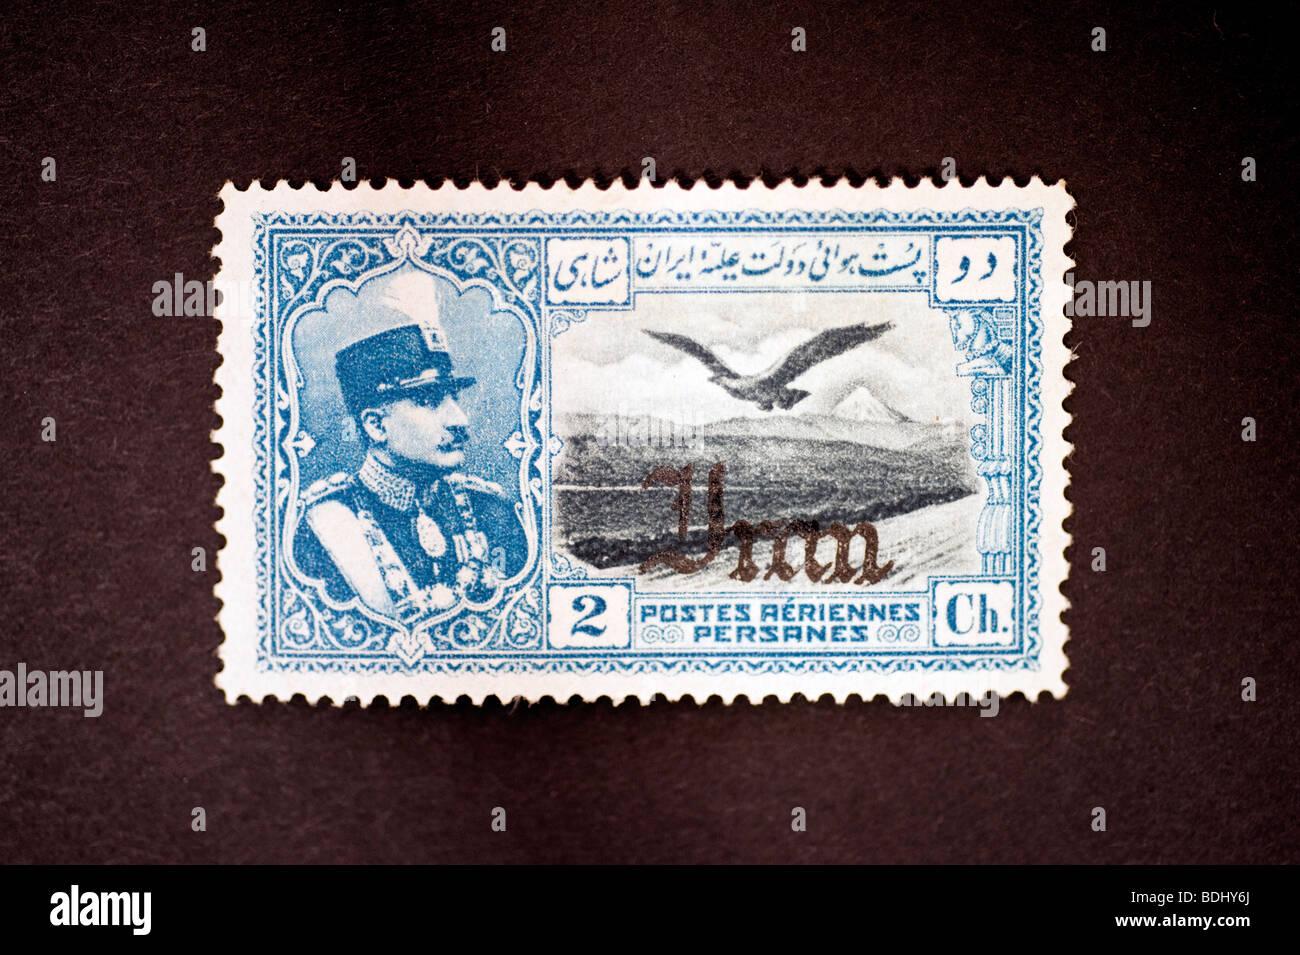 Postage stamp Persia, Iran - Stock Image